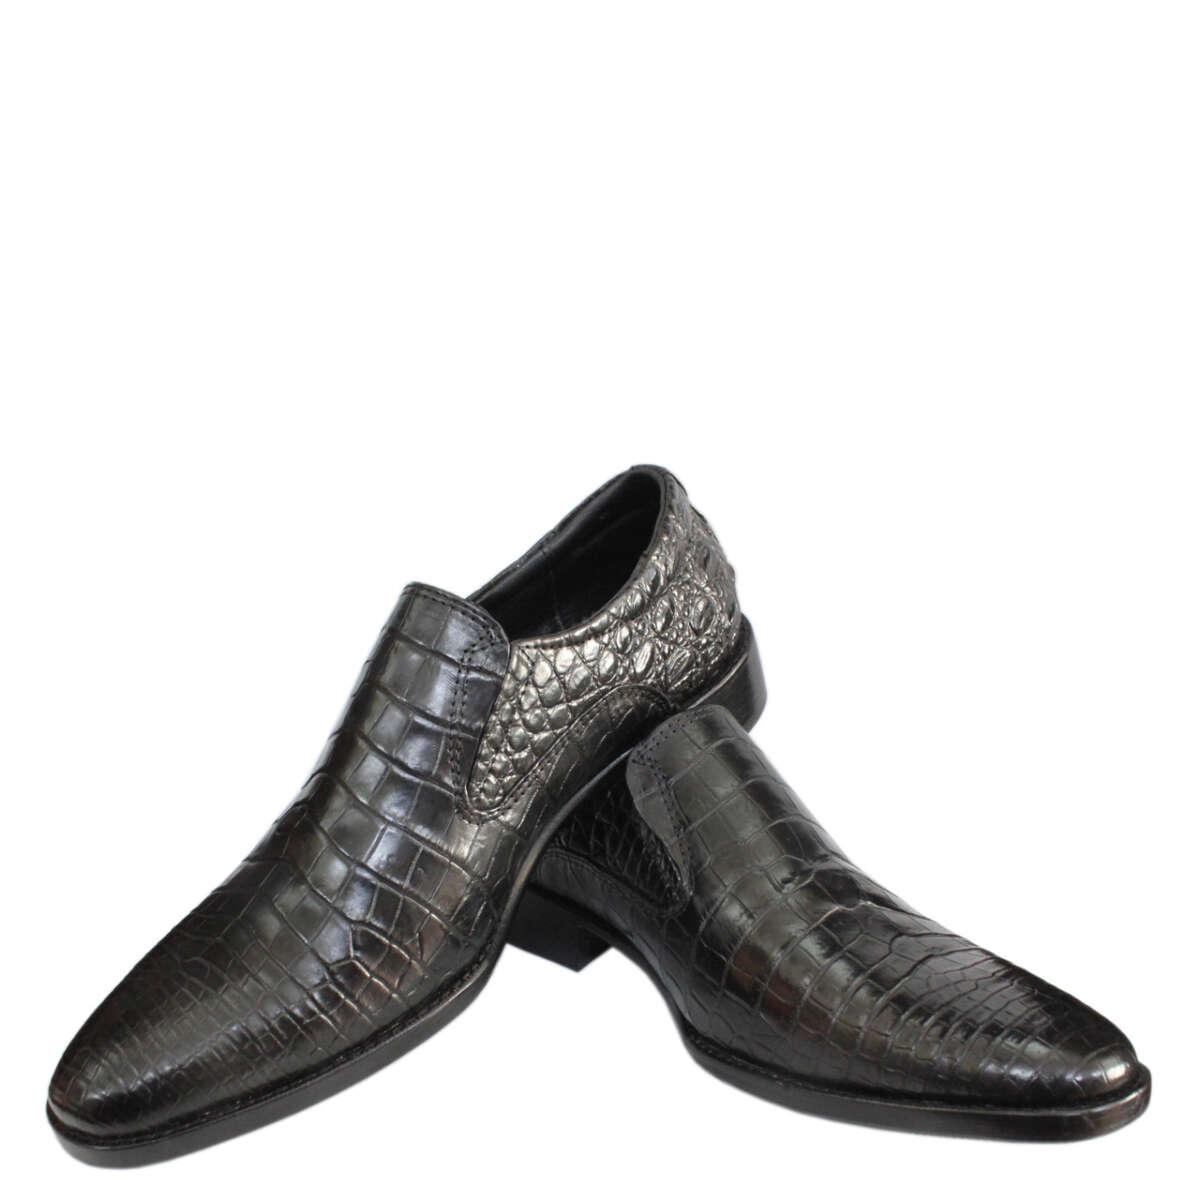 Giày nam da cá sấu S876a